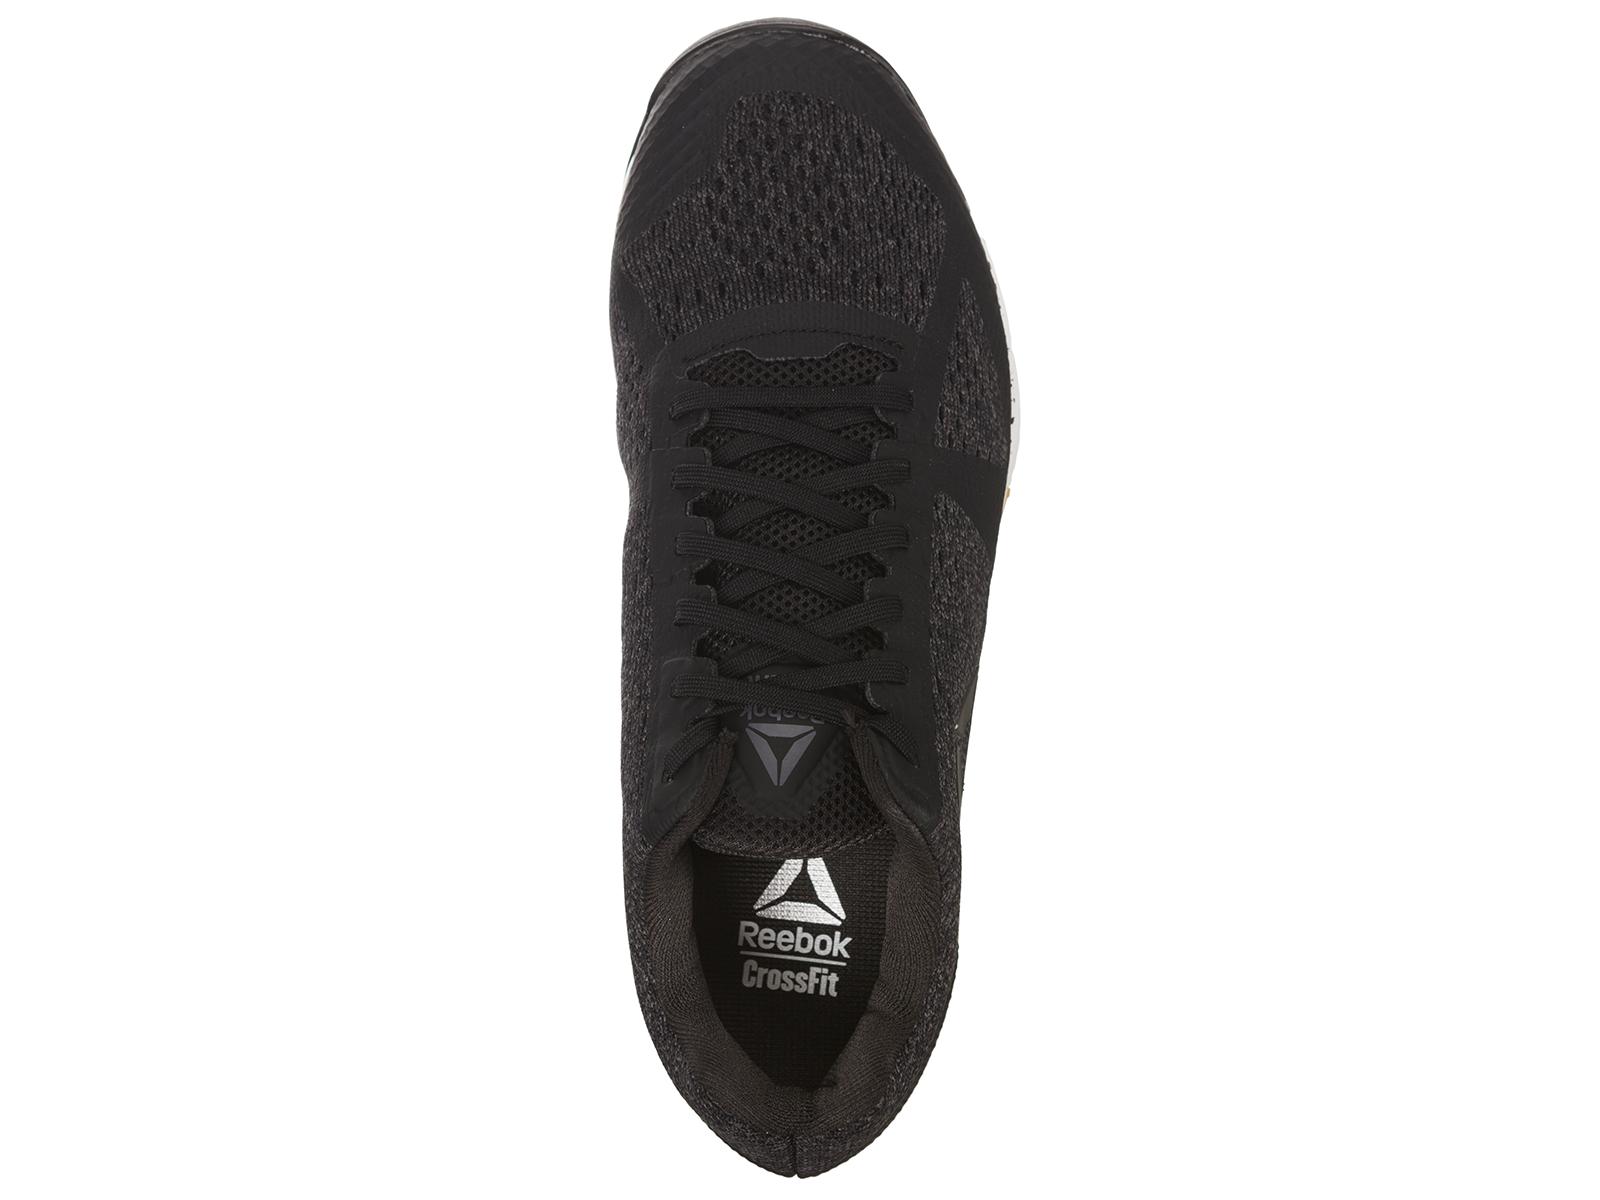 Reebok Crossfit Trainer Shoes Uk